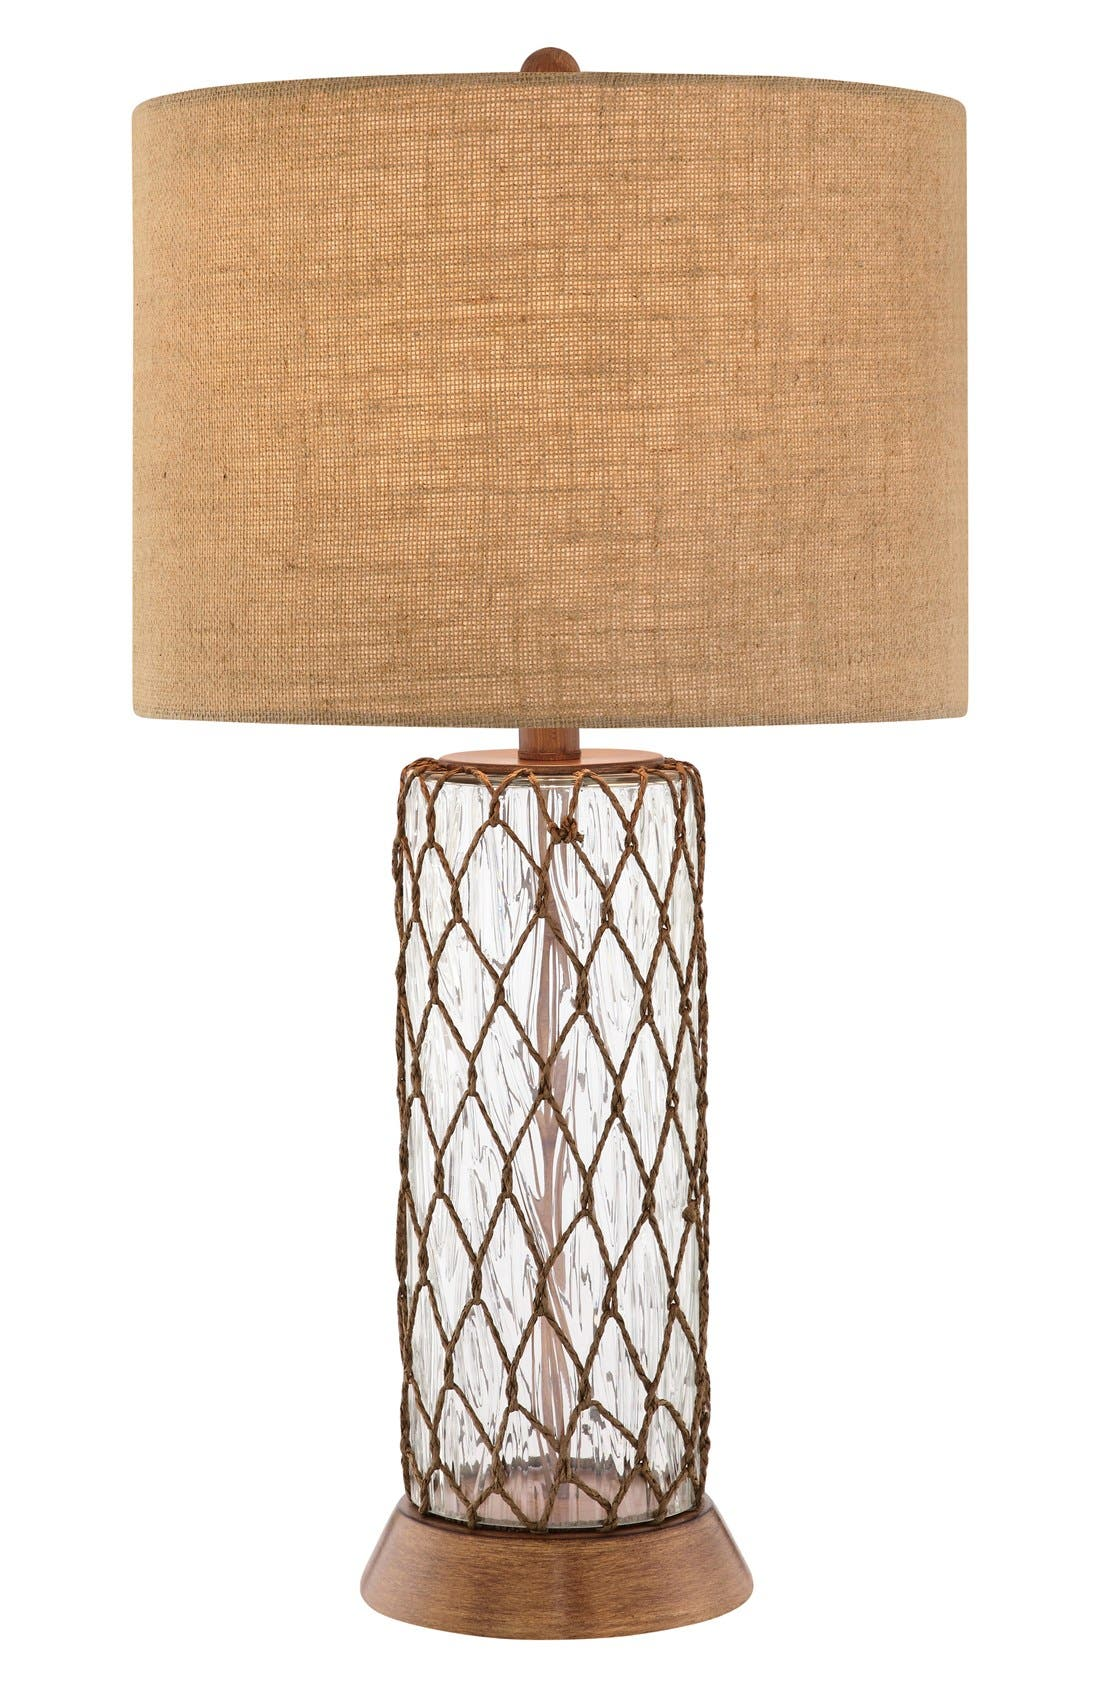 JALEXANDER LIGHTING Clear Glass Table Lamp